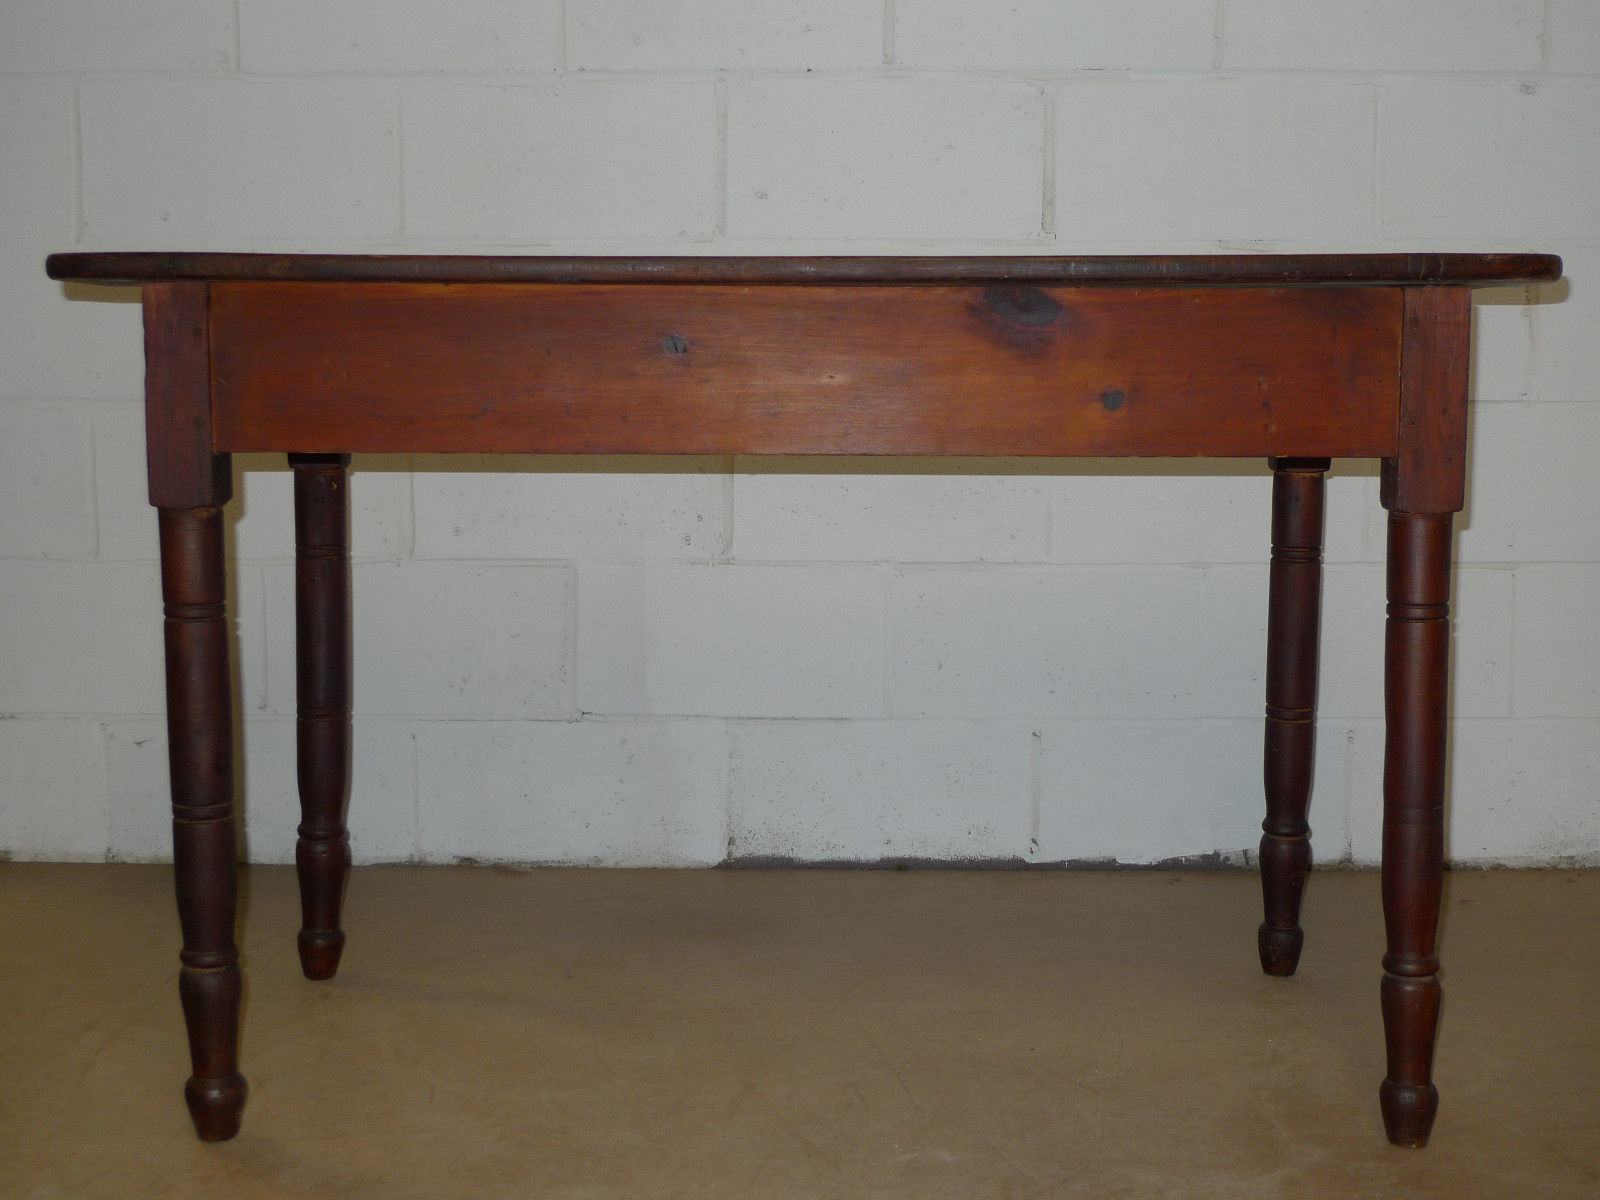 American Sheraton Period Knotty Pine Farmhouse Table Antique